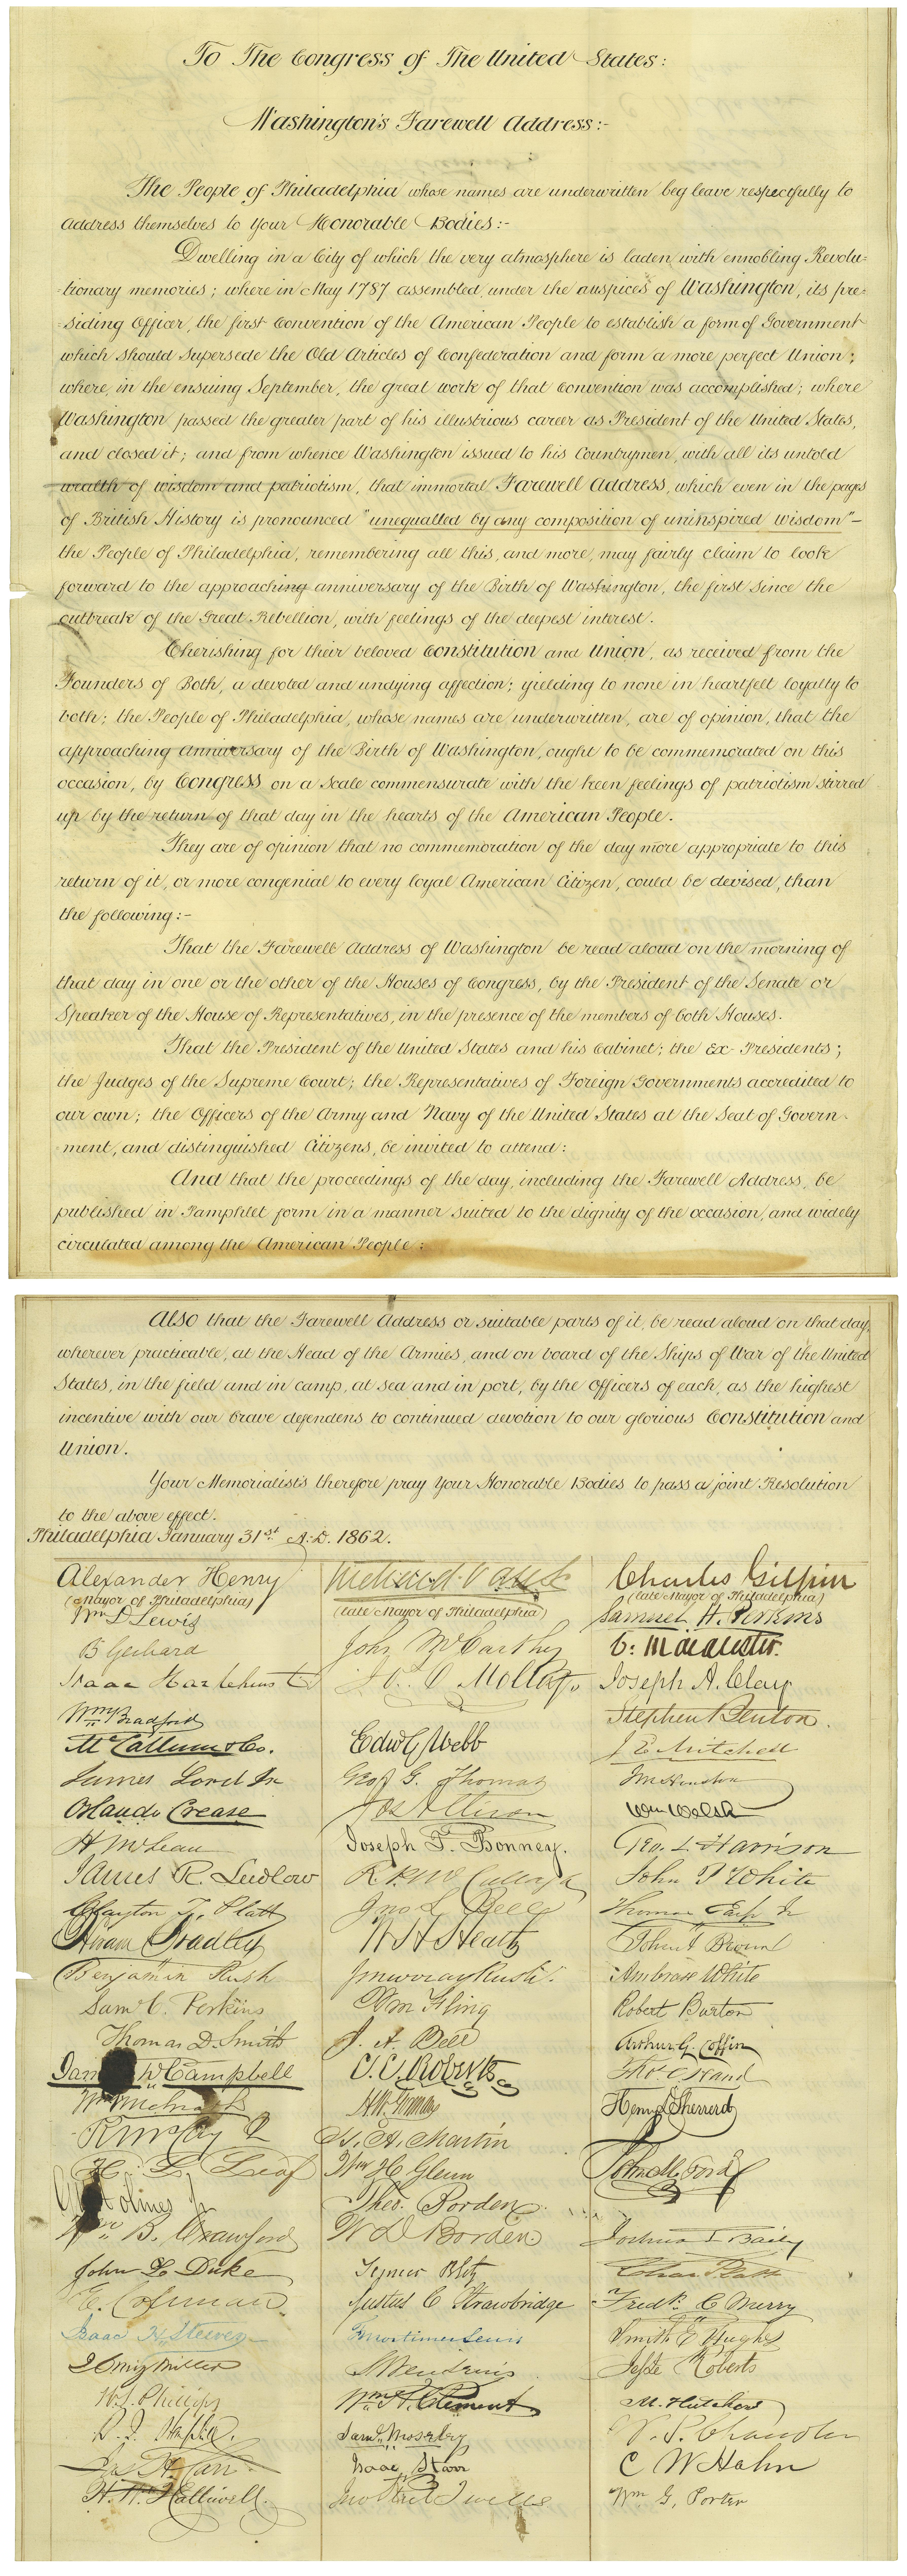 George Washington's Birthday | National Archives